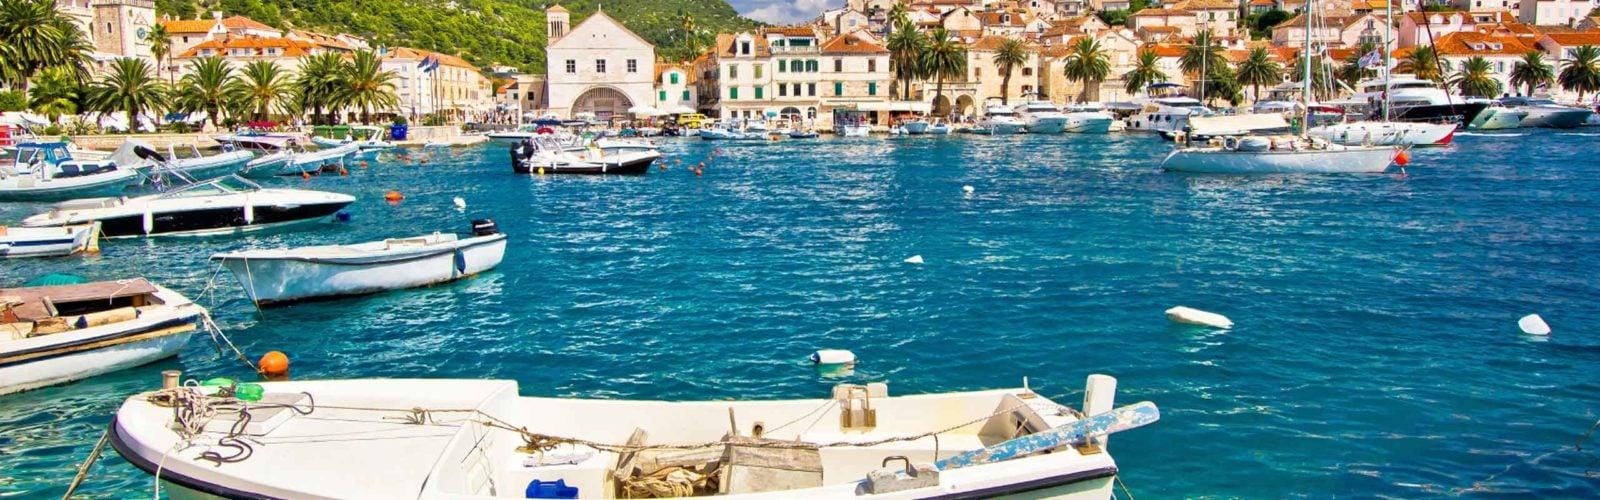 Hvar waterfront, Croatia.